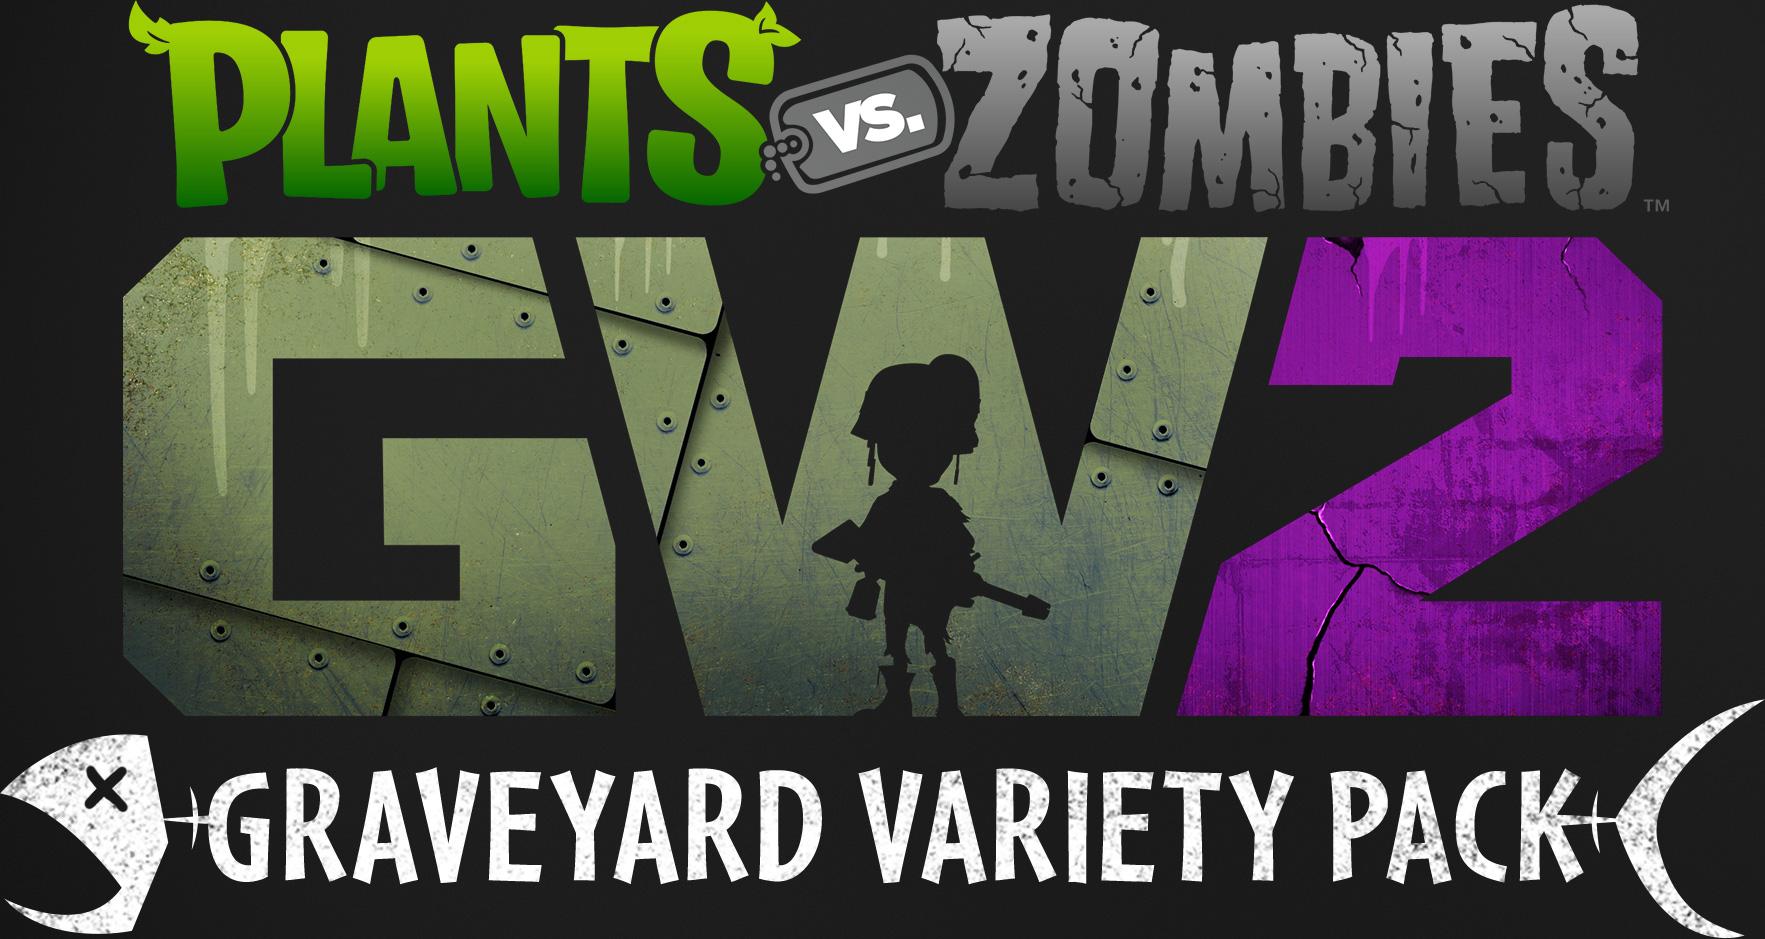 Graveyard Variety Pack